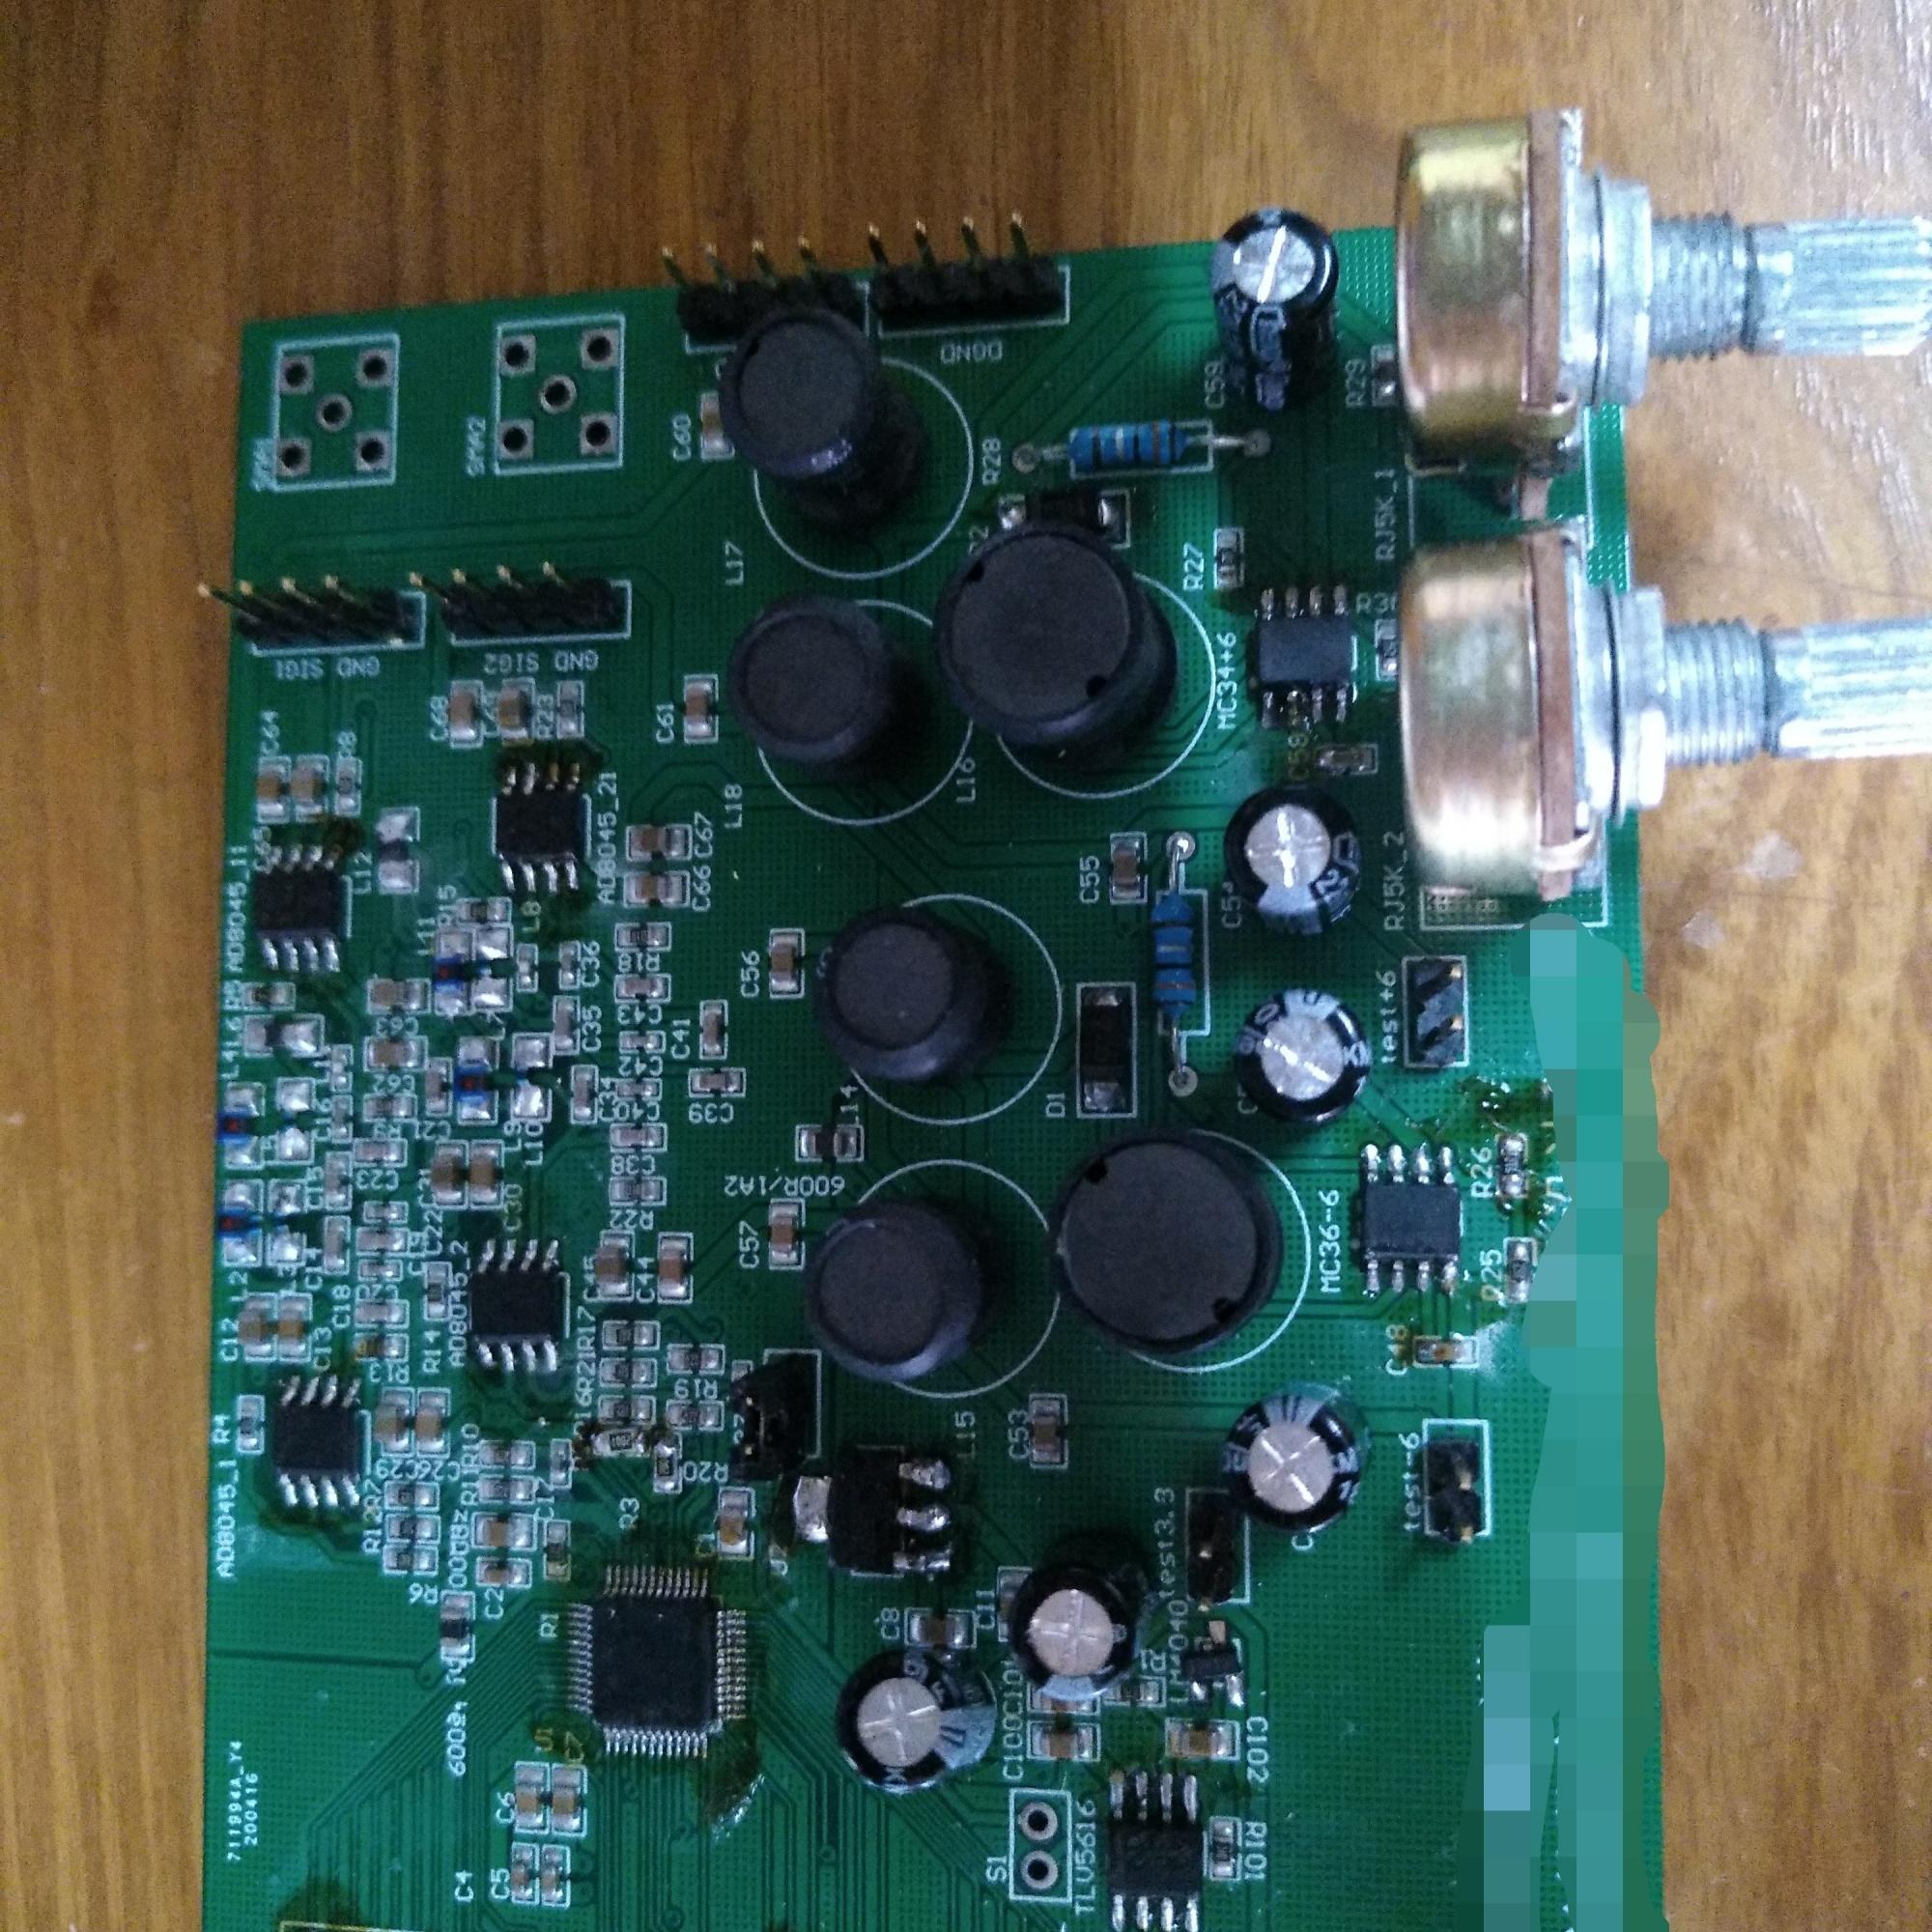 DC-DC電源芯片MC34063ADR由+5v轉換為-6v,沒帶負載輸出正常,帶負載后輸出-4.3v。